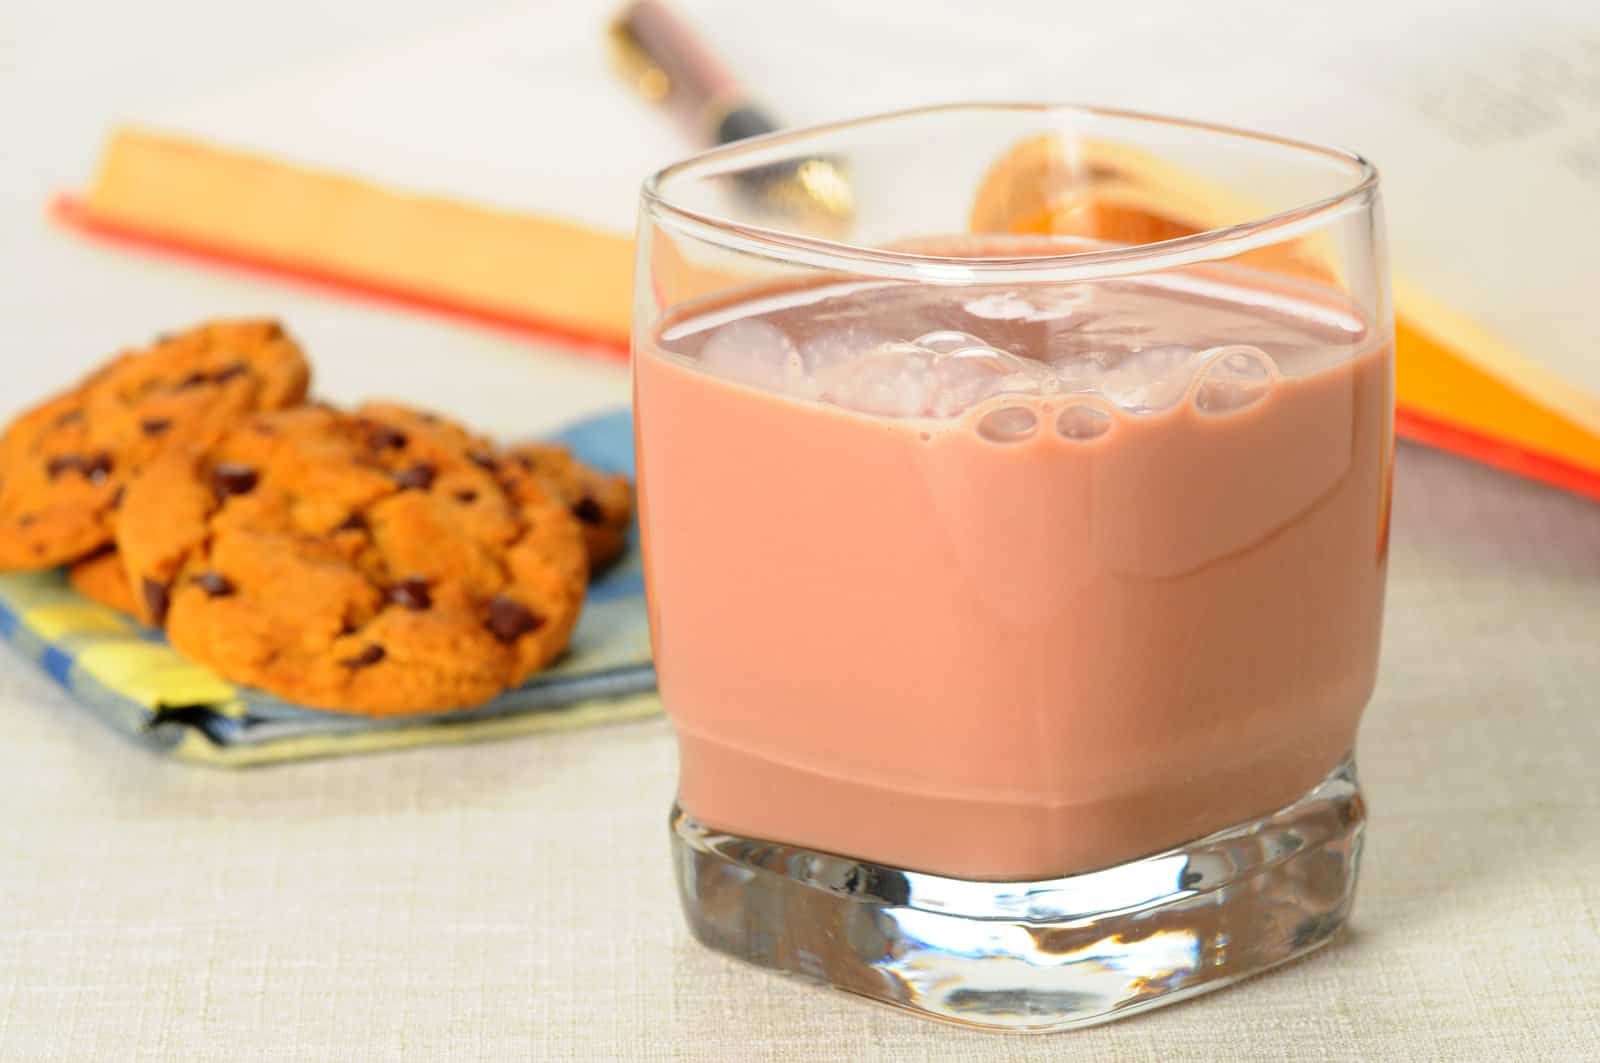 Can You Freeze Chocolate Milk?